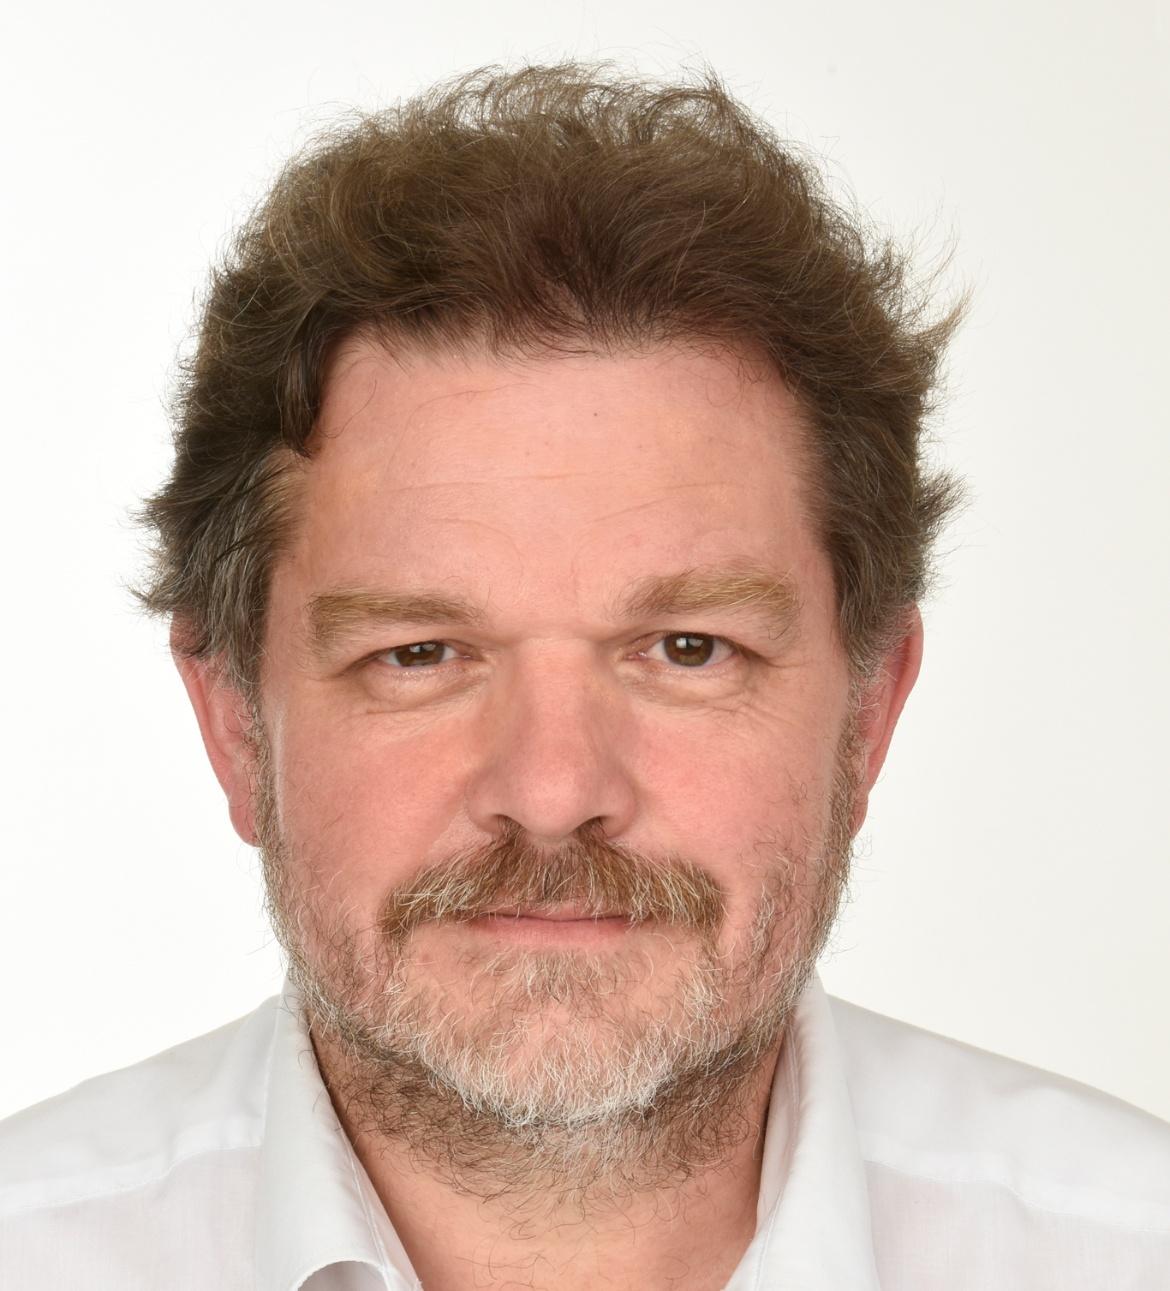 Harald Hentze